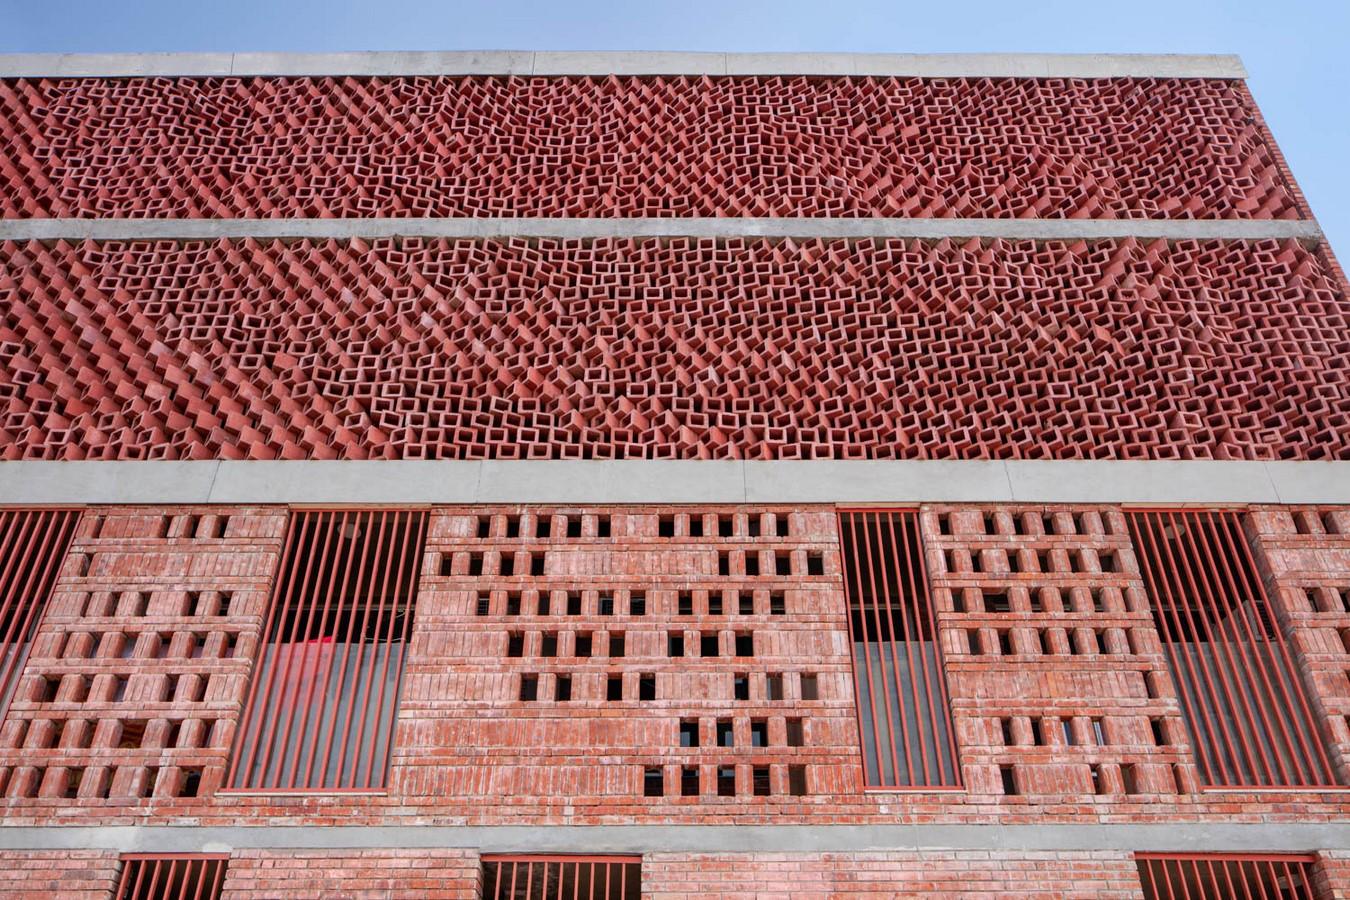 Girls' Hostel Featuring Free-Standing Façade In Gurugram built by Zero Energy Design Lab - Sheet8